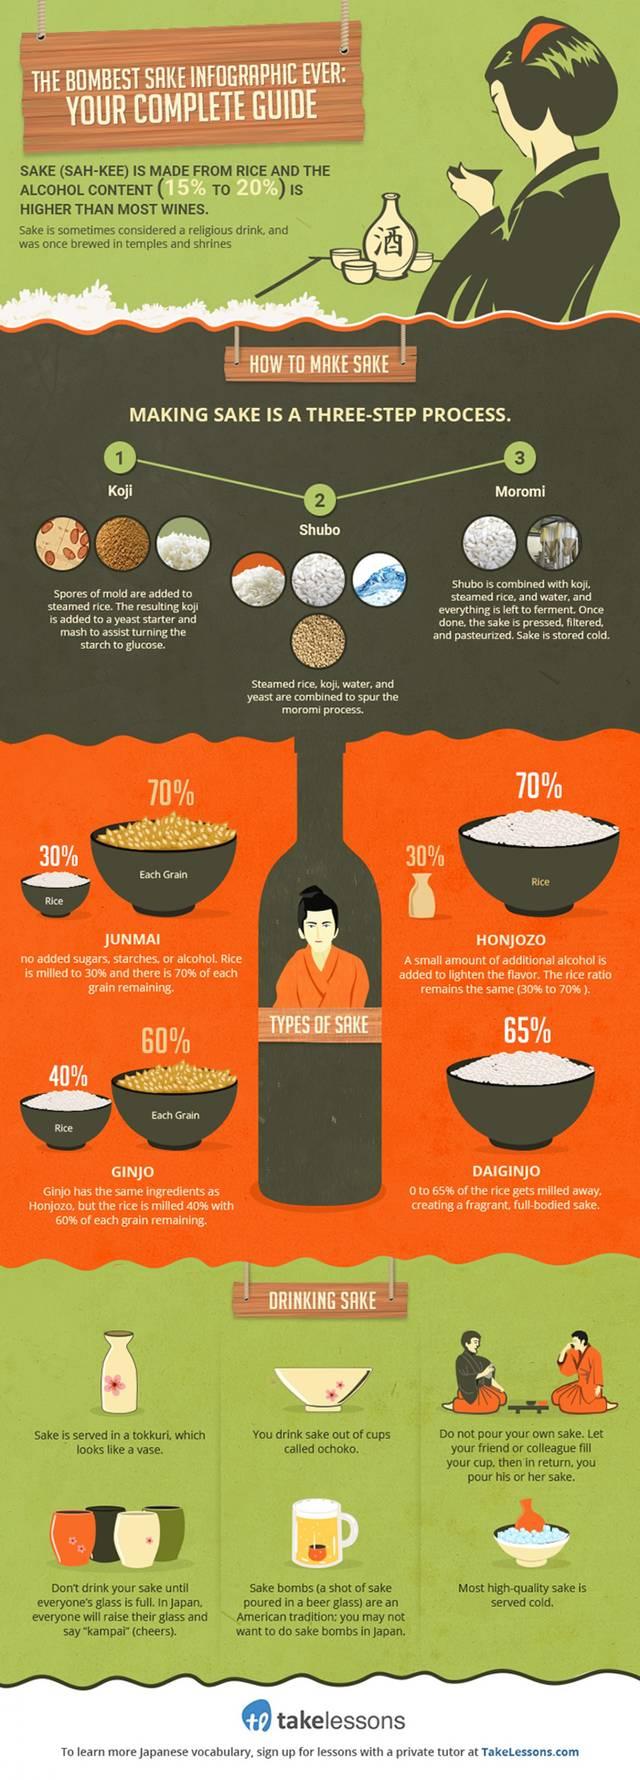 Your complete guide to japanese sake 55de1de4afce8 w1500